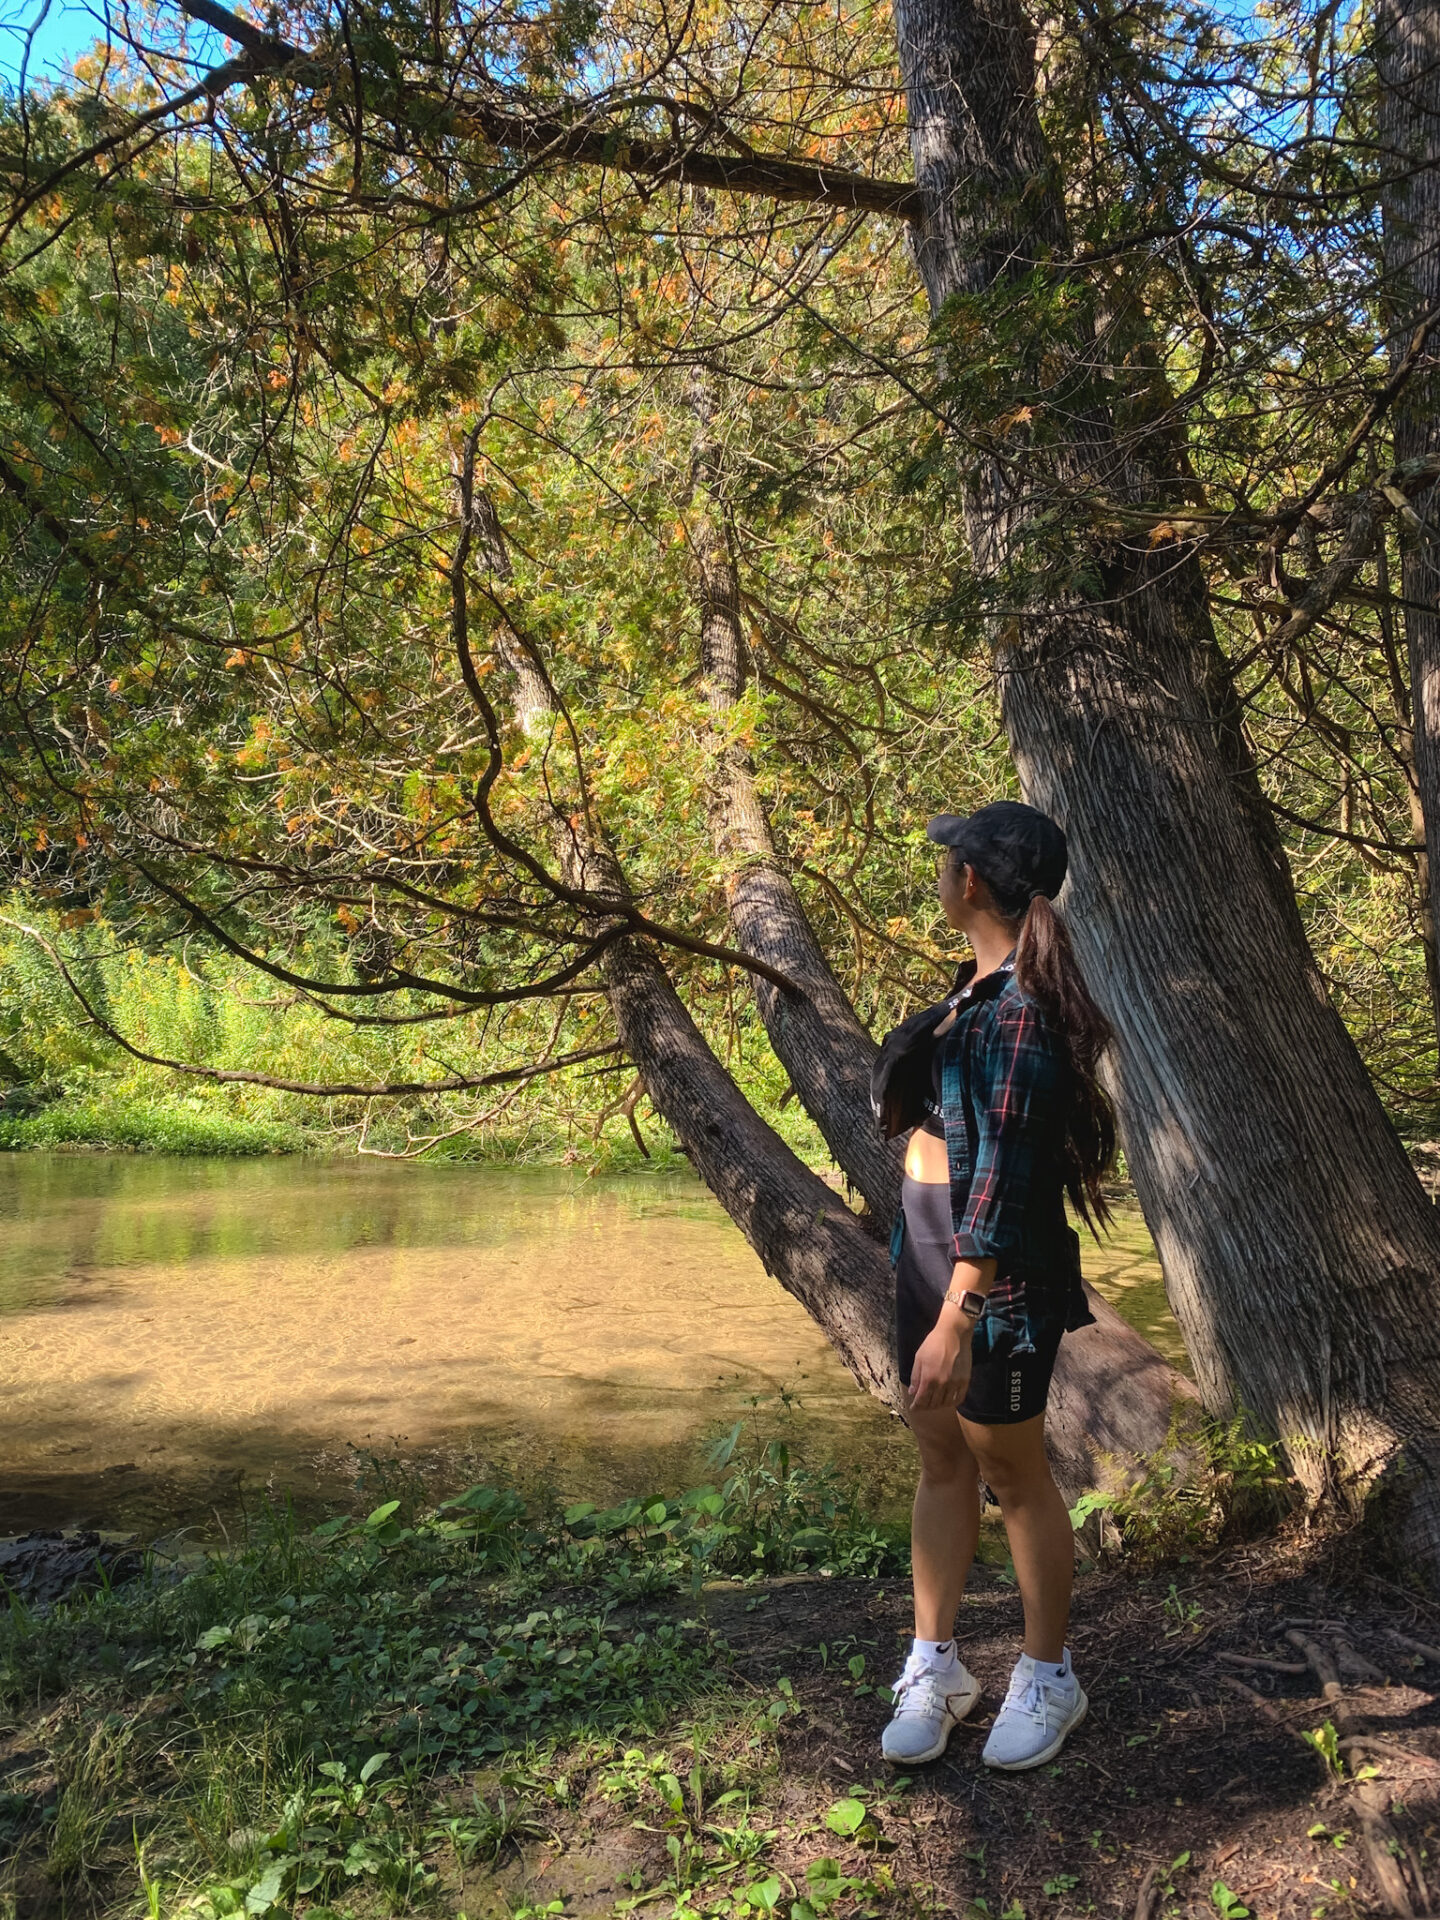 Orono Crown Lands hike in Bowmanville, Durham Region